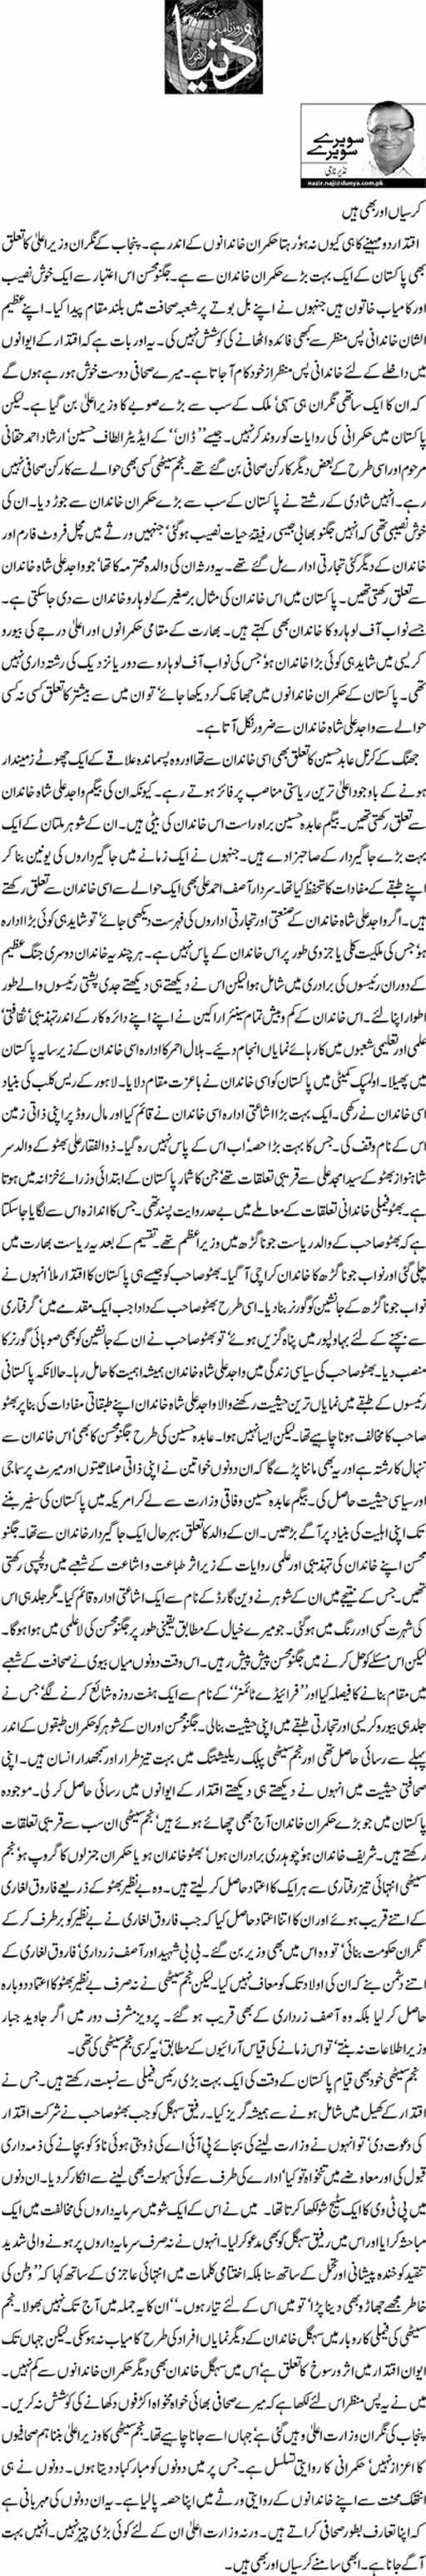 Source: http://e.dunya.com.pk/colum.php?date=2013-03-28&edition=LHR&id=6592_98275084